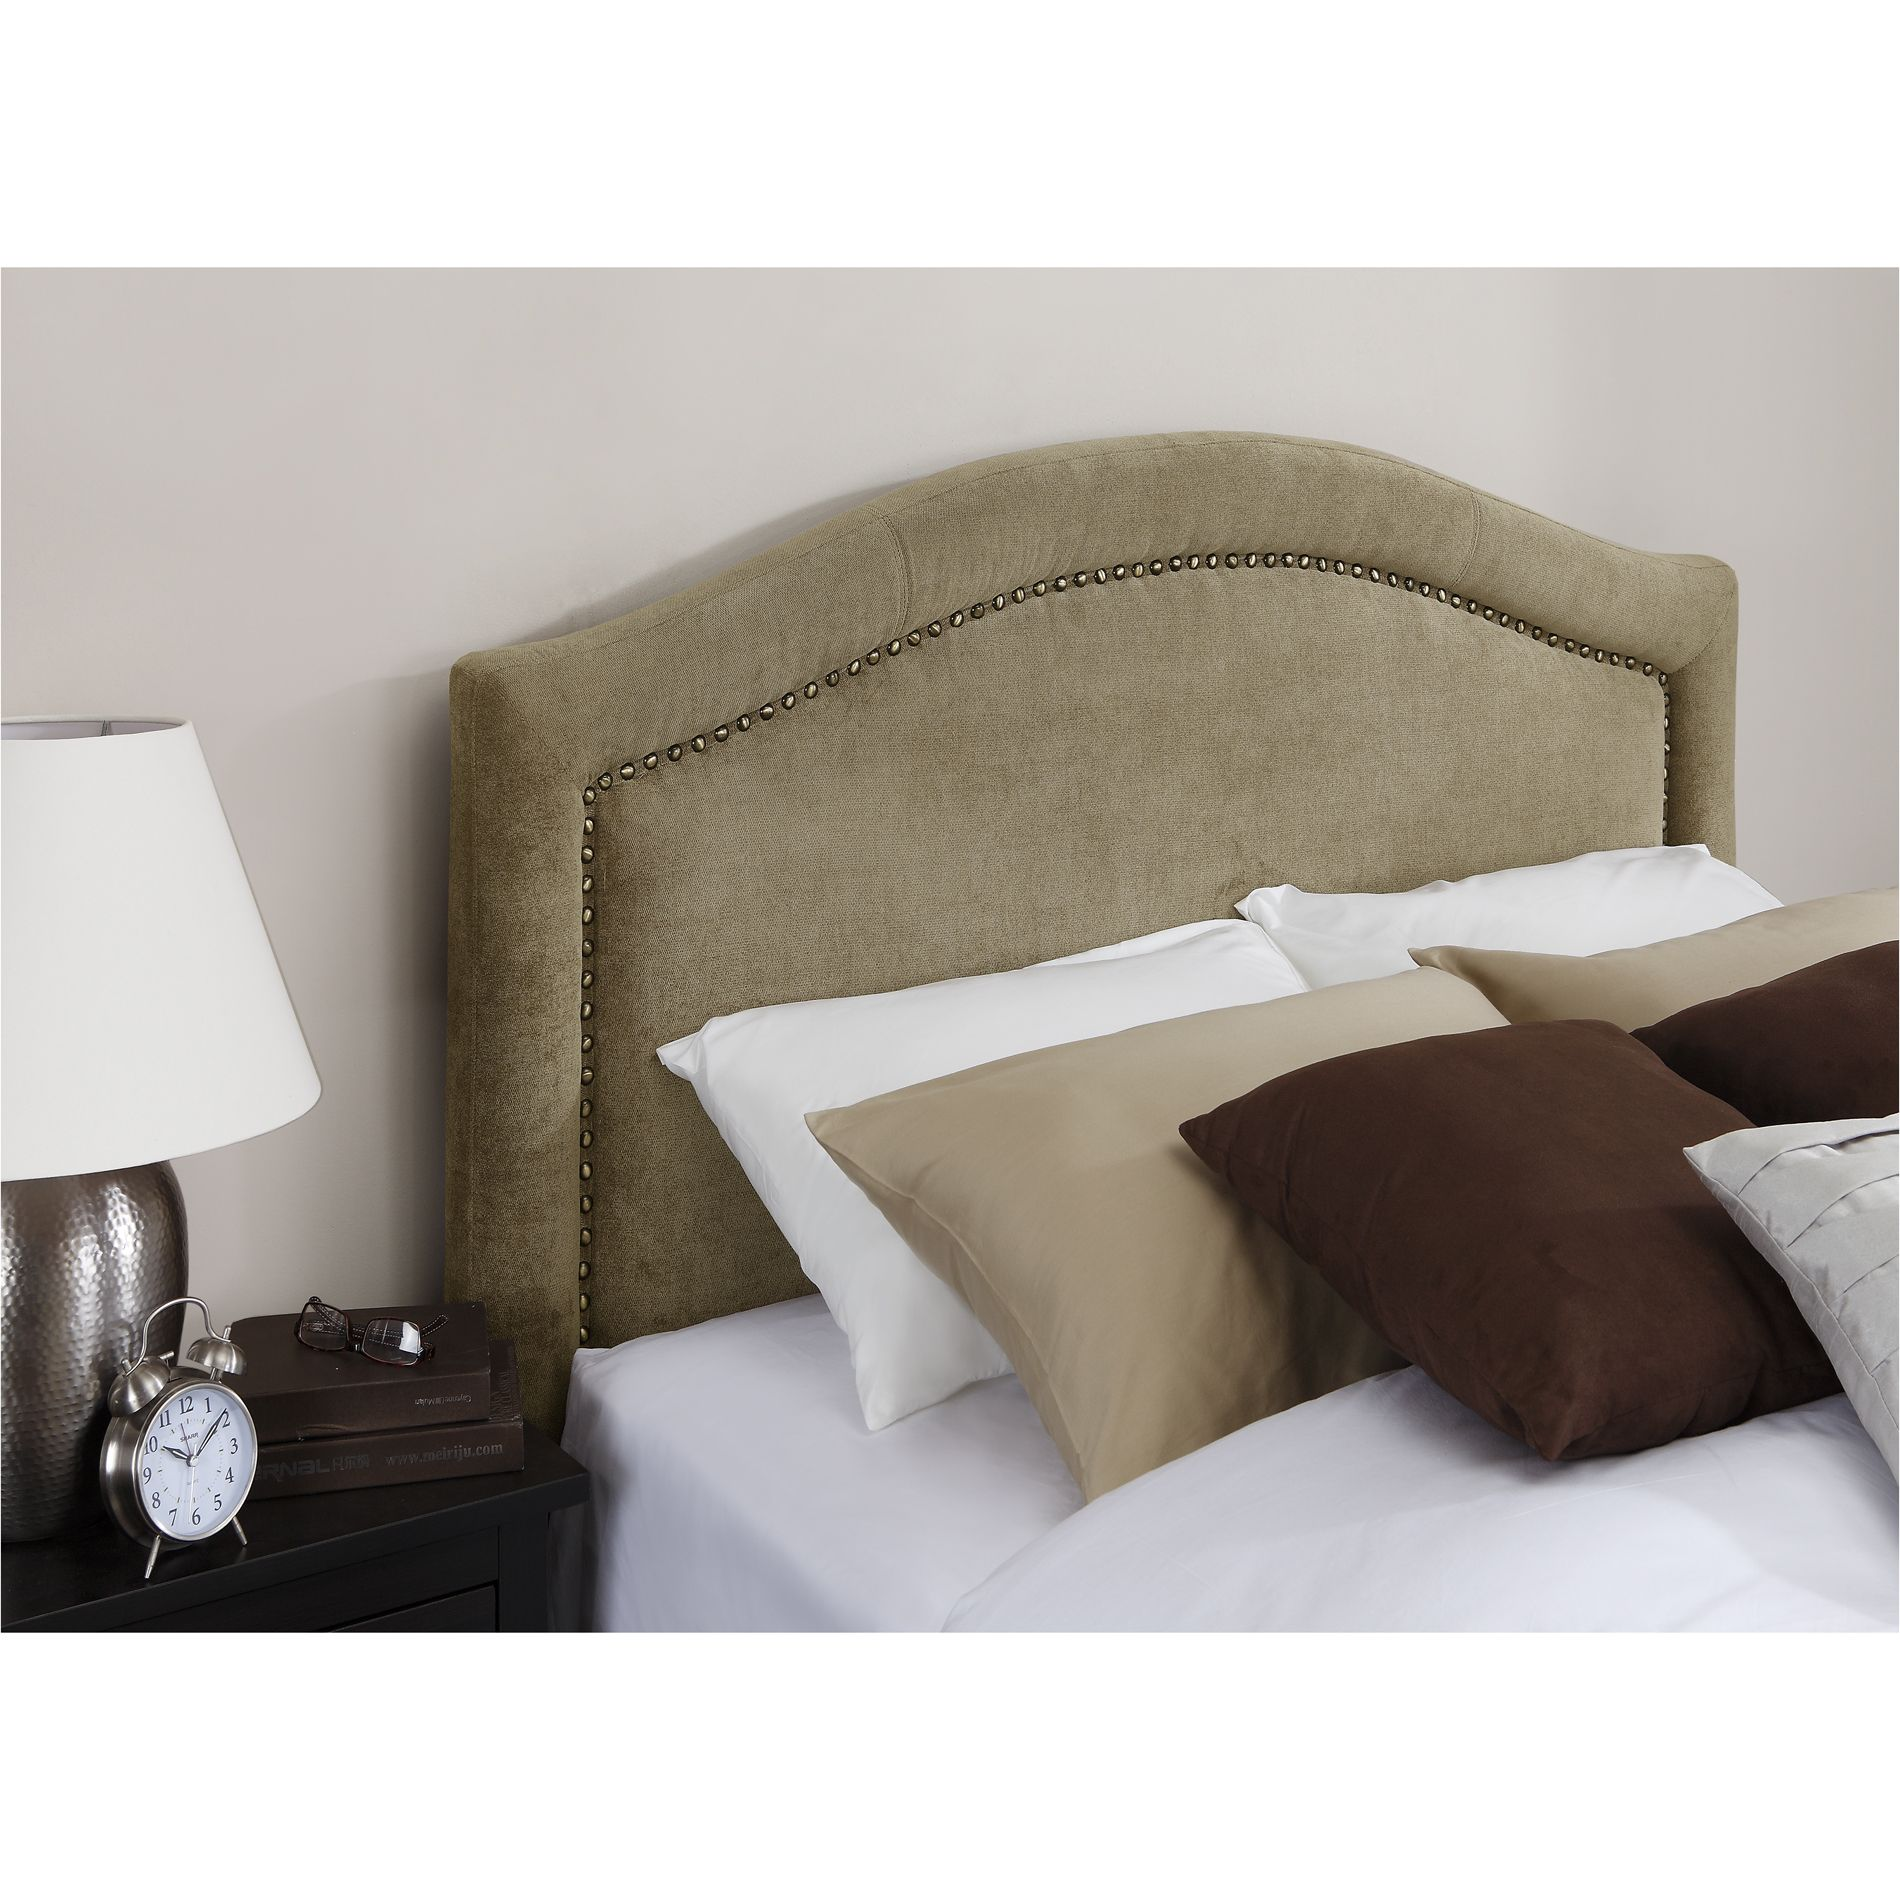 Sears Furniture Bedroom Dorel Signature Addison Stone Headboard Available In Full Queen